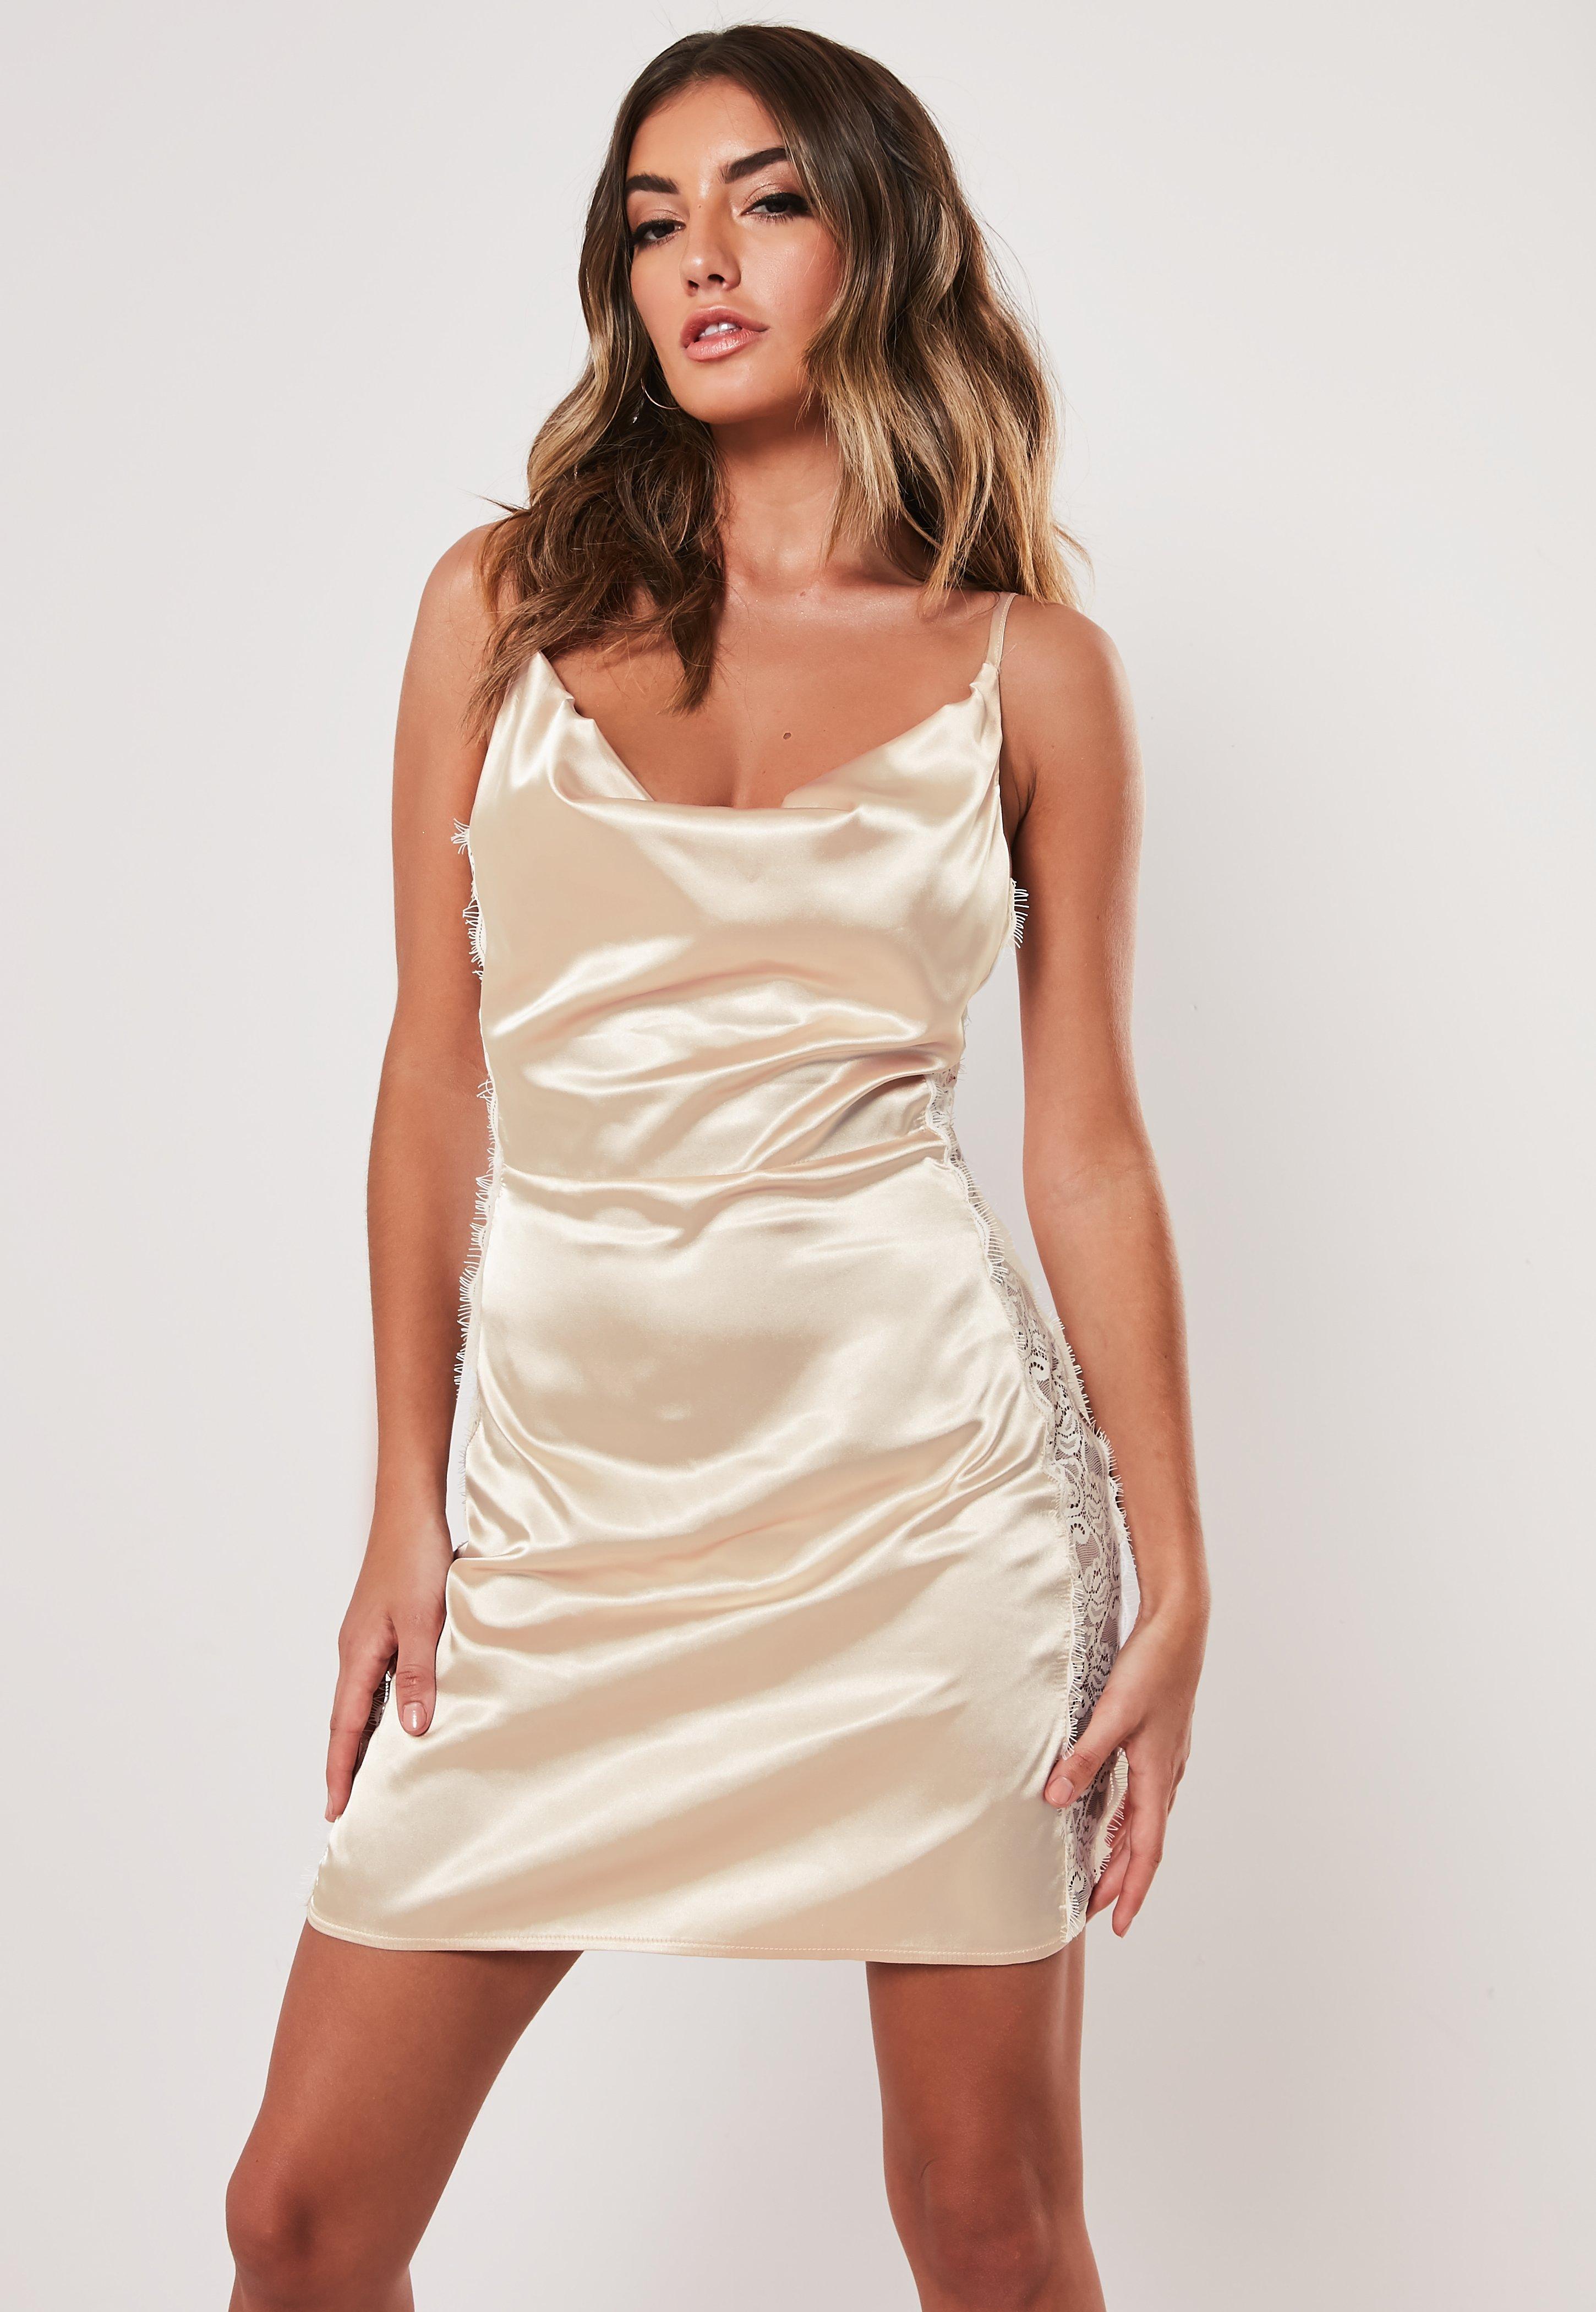 bba65e4fc34 Lace Dresses